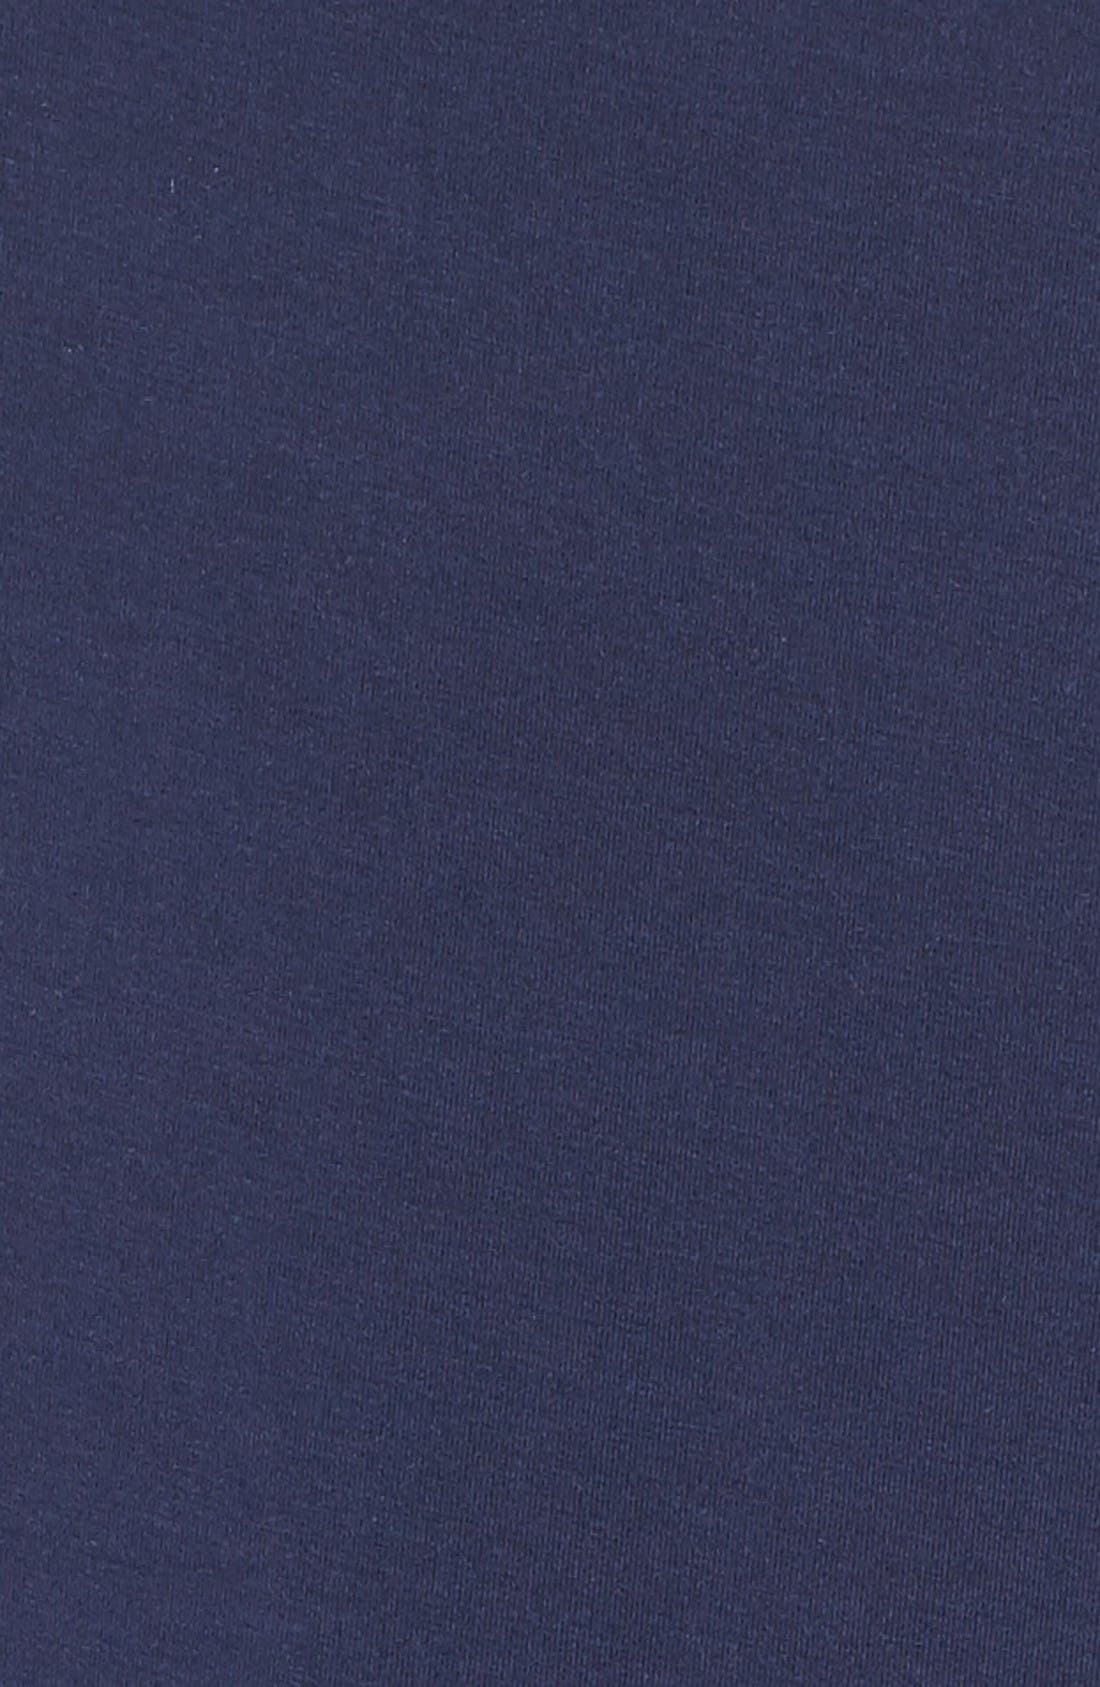 Stretch Modal Pajamas,                             Alternate thumbnail 2, color,                             Peacoat Blue